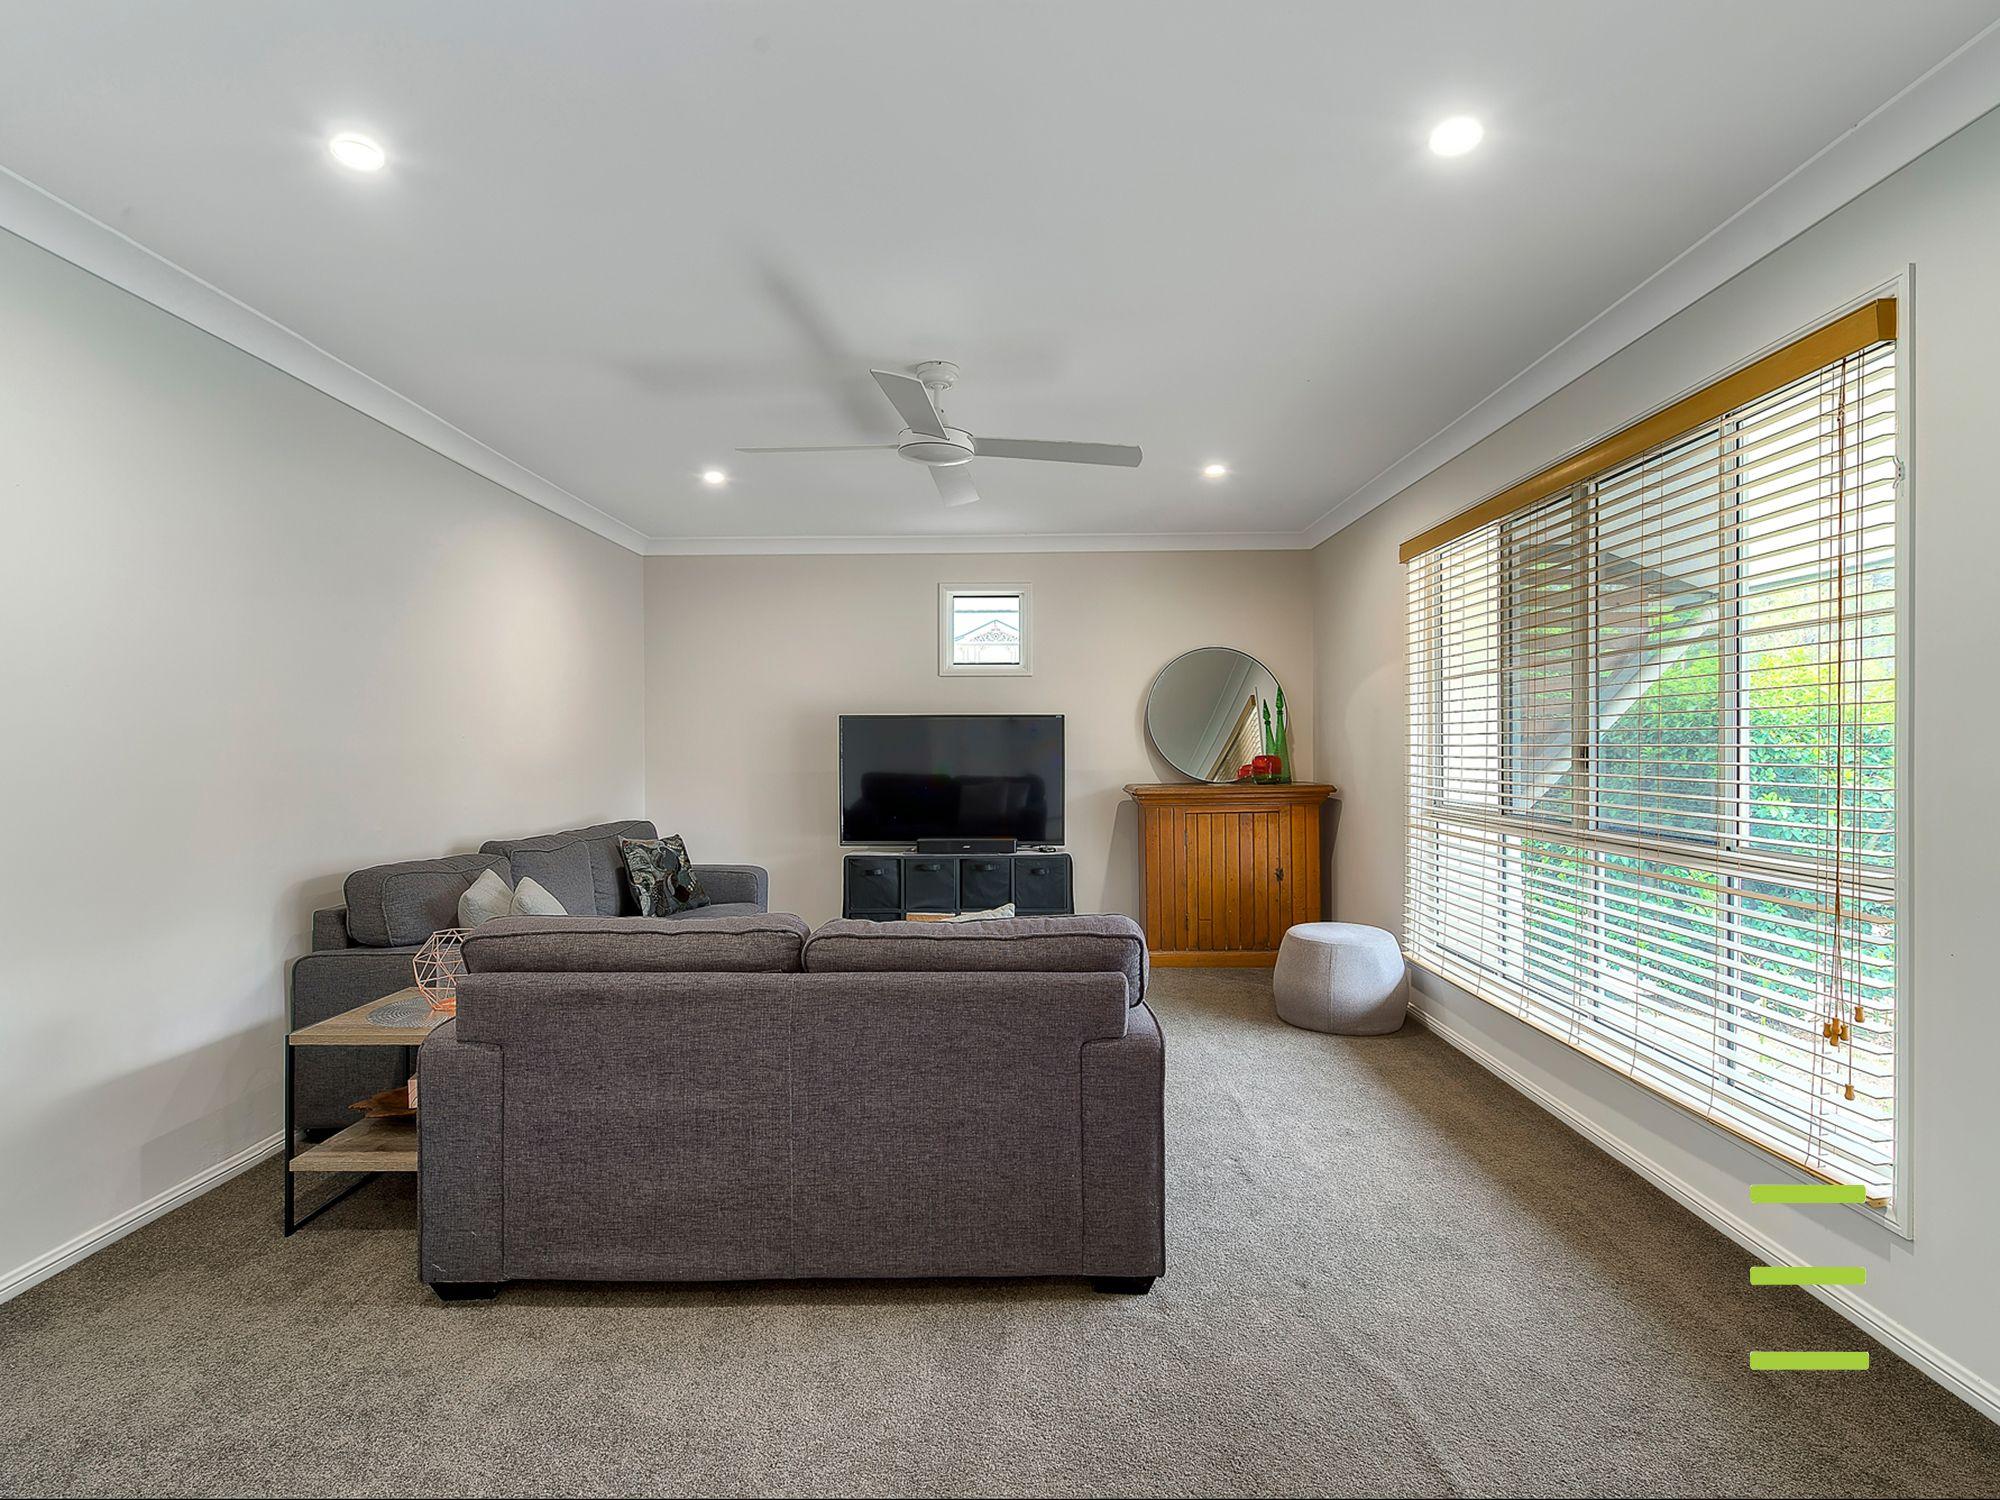 2 Coolgardie Court Arana Hills 4054